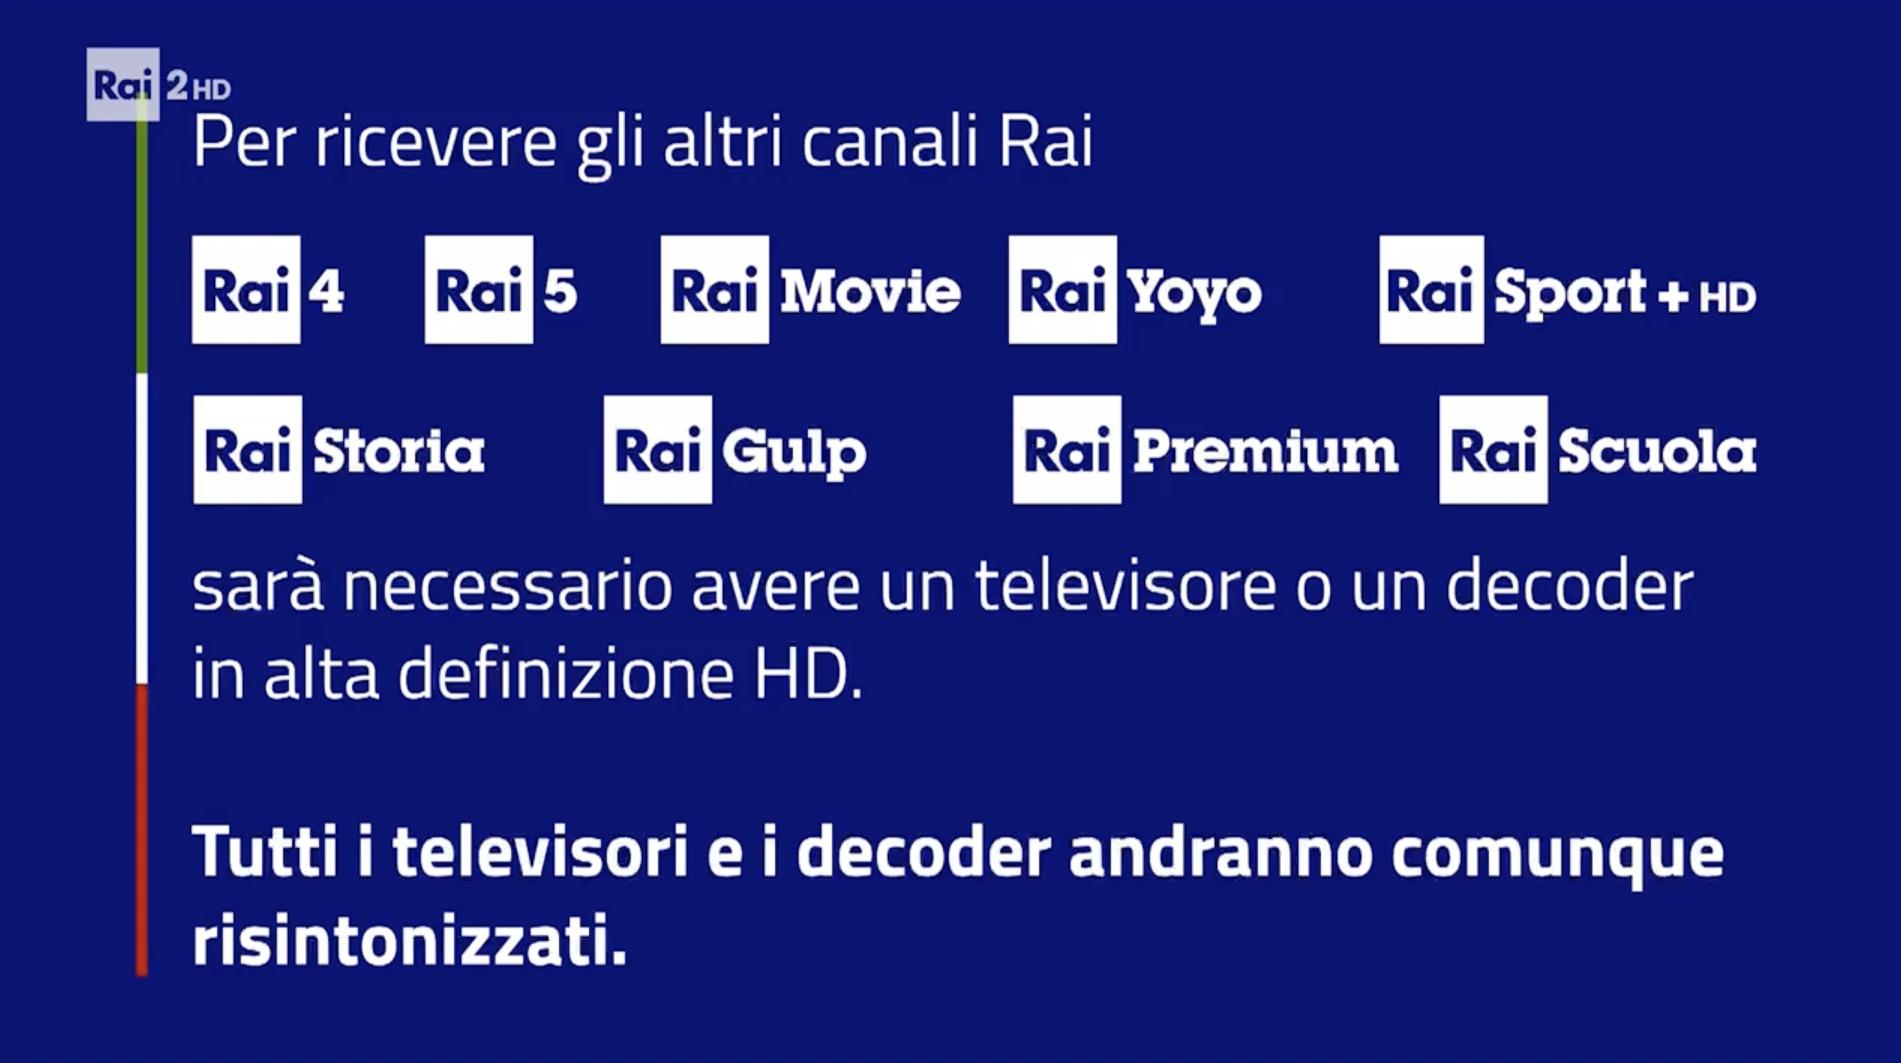 Switch-off canali HD